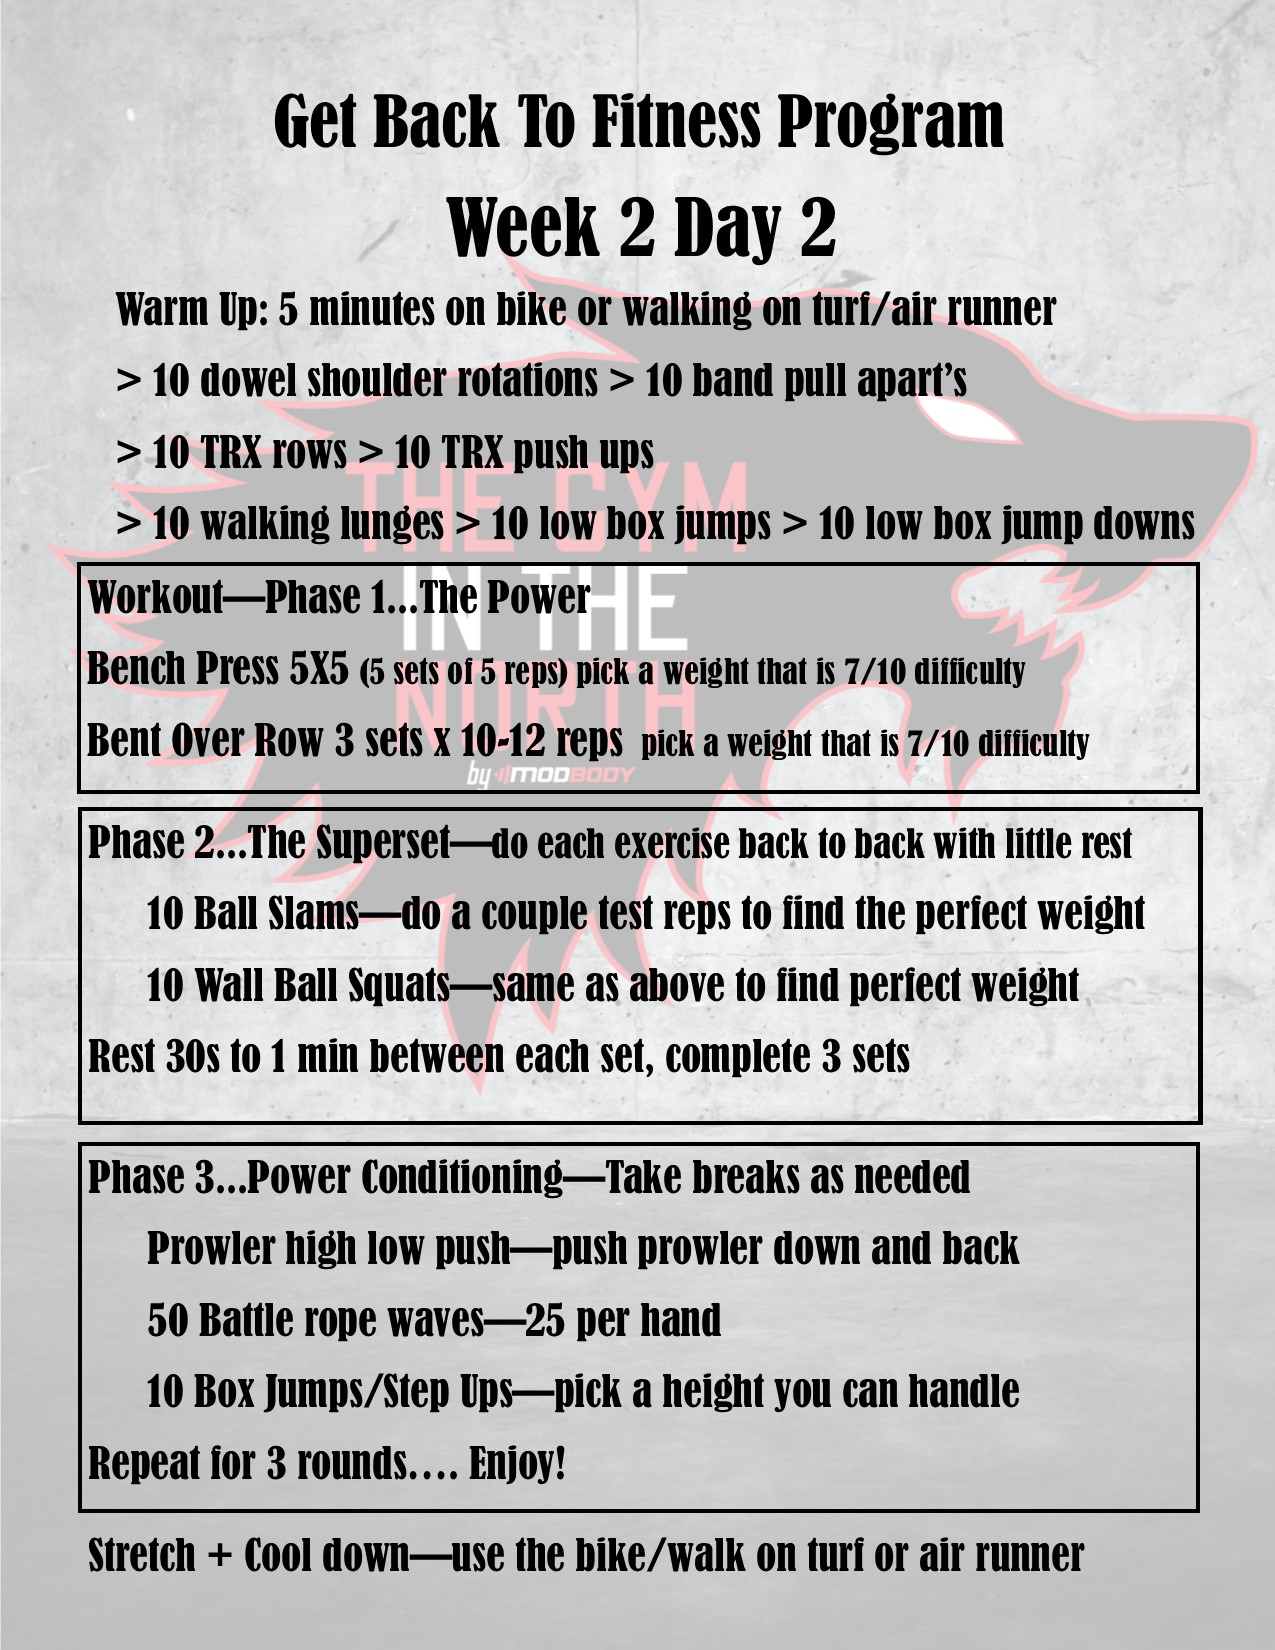 Week-2-Day-2-bench-workout.jpg